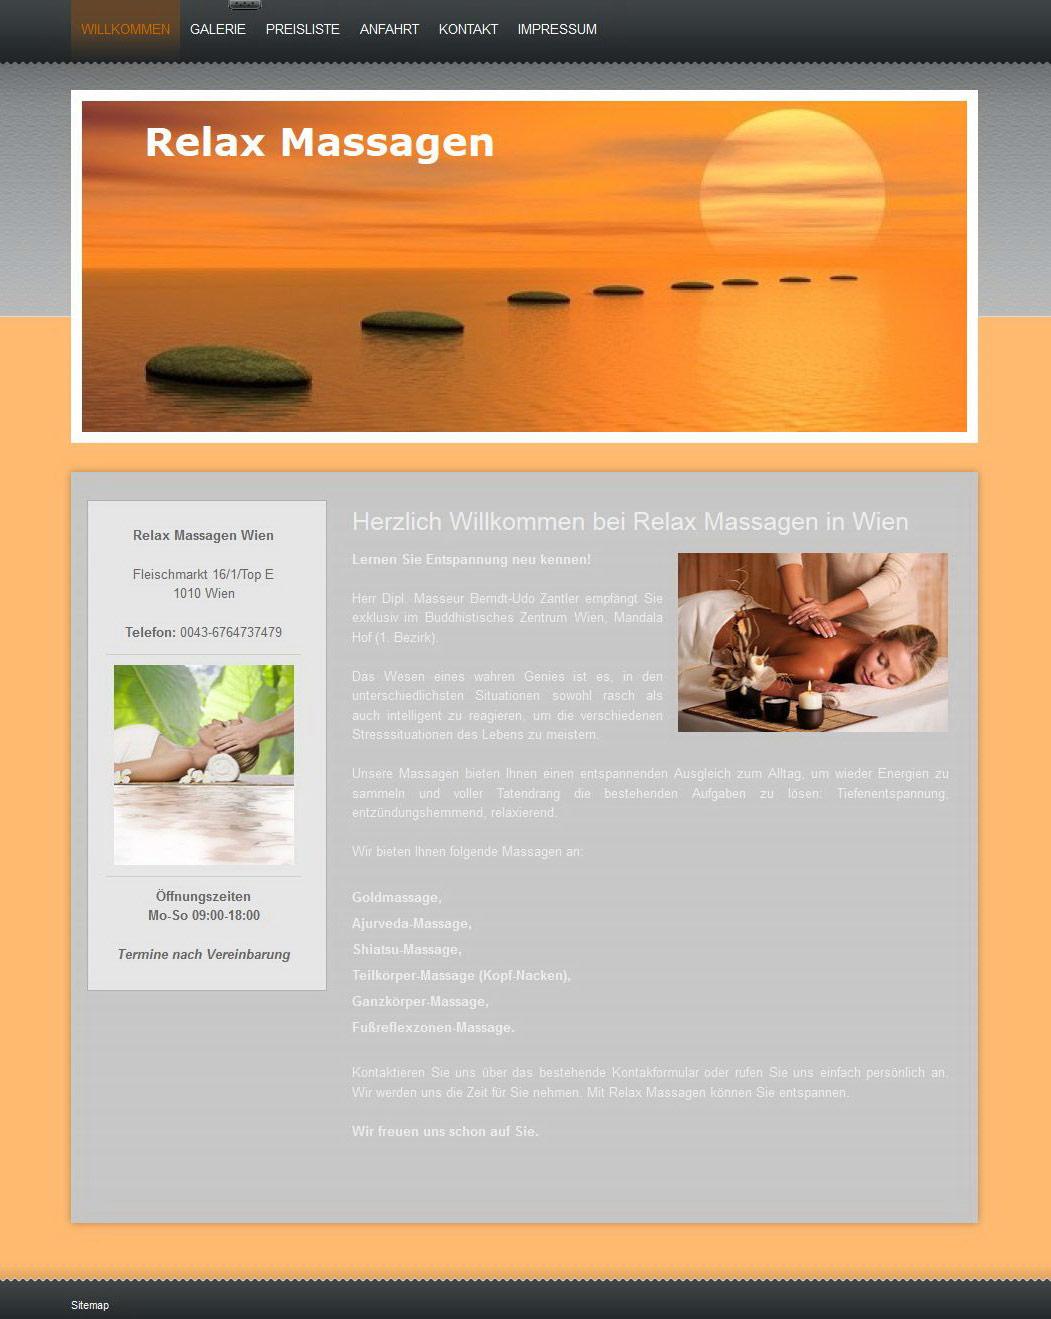 Massage website in Wien, austria : steps to the sun illustration.